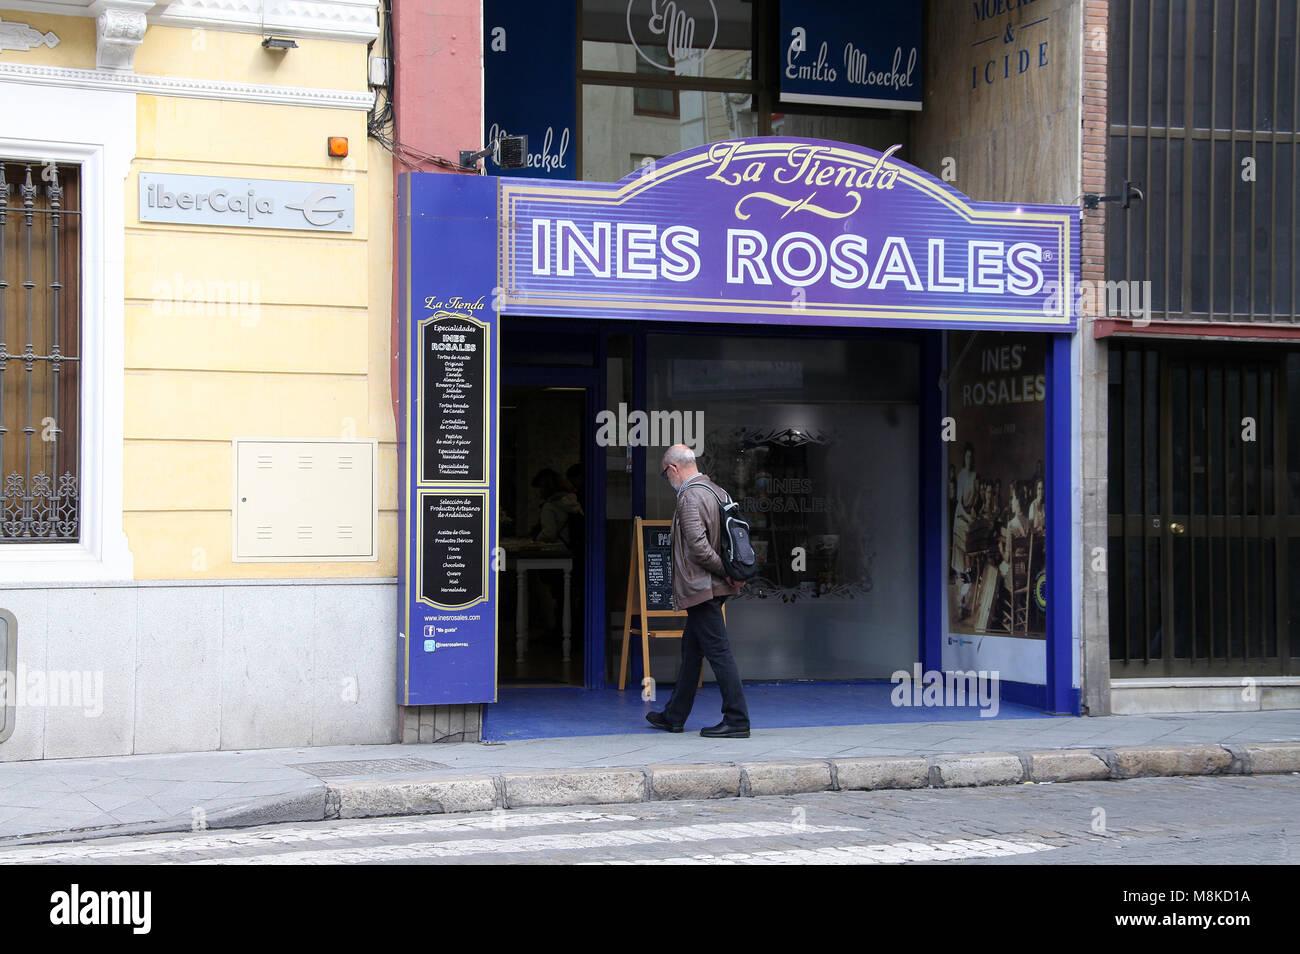 Ines Rosales Shop in Sevilla Stockbild